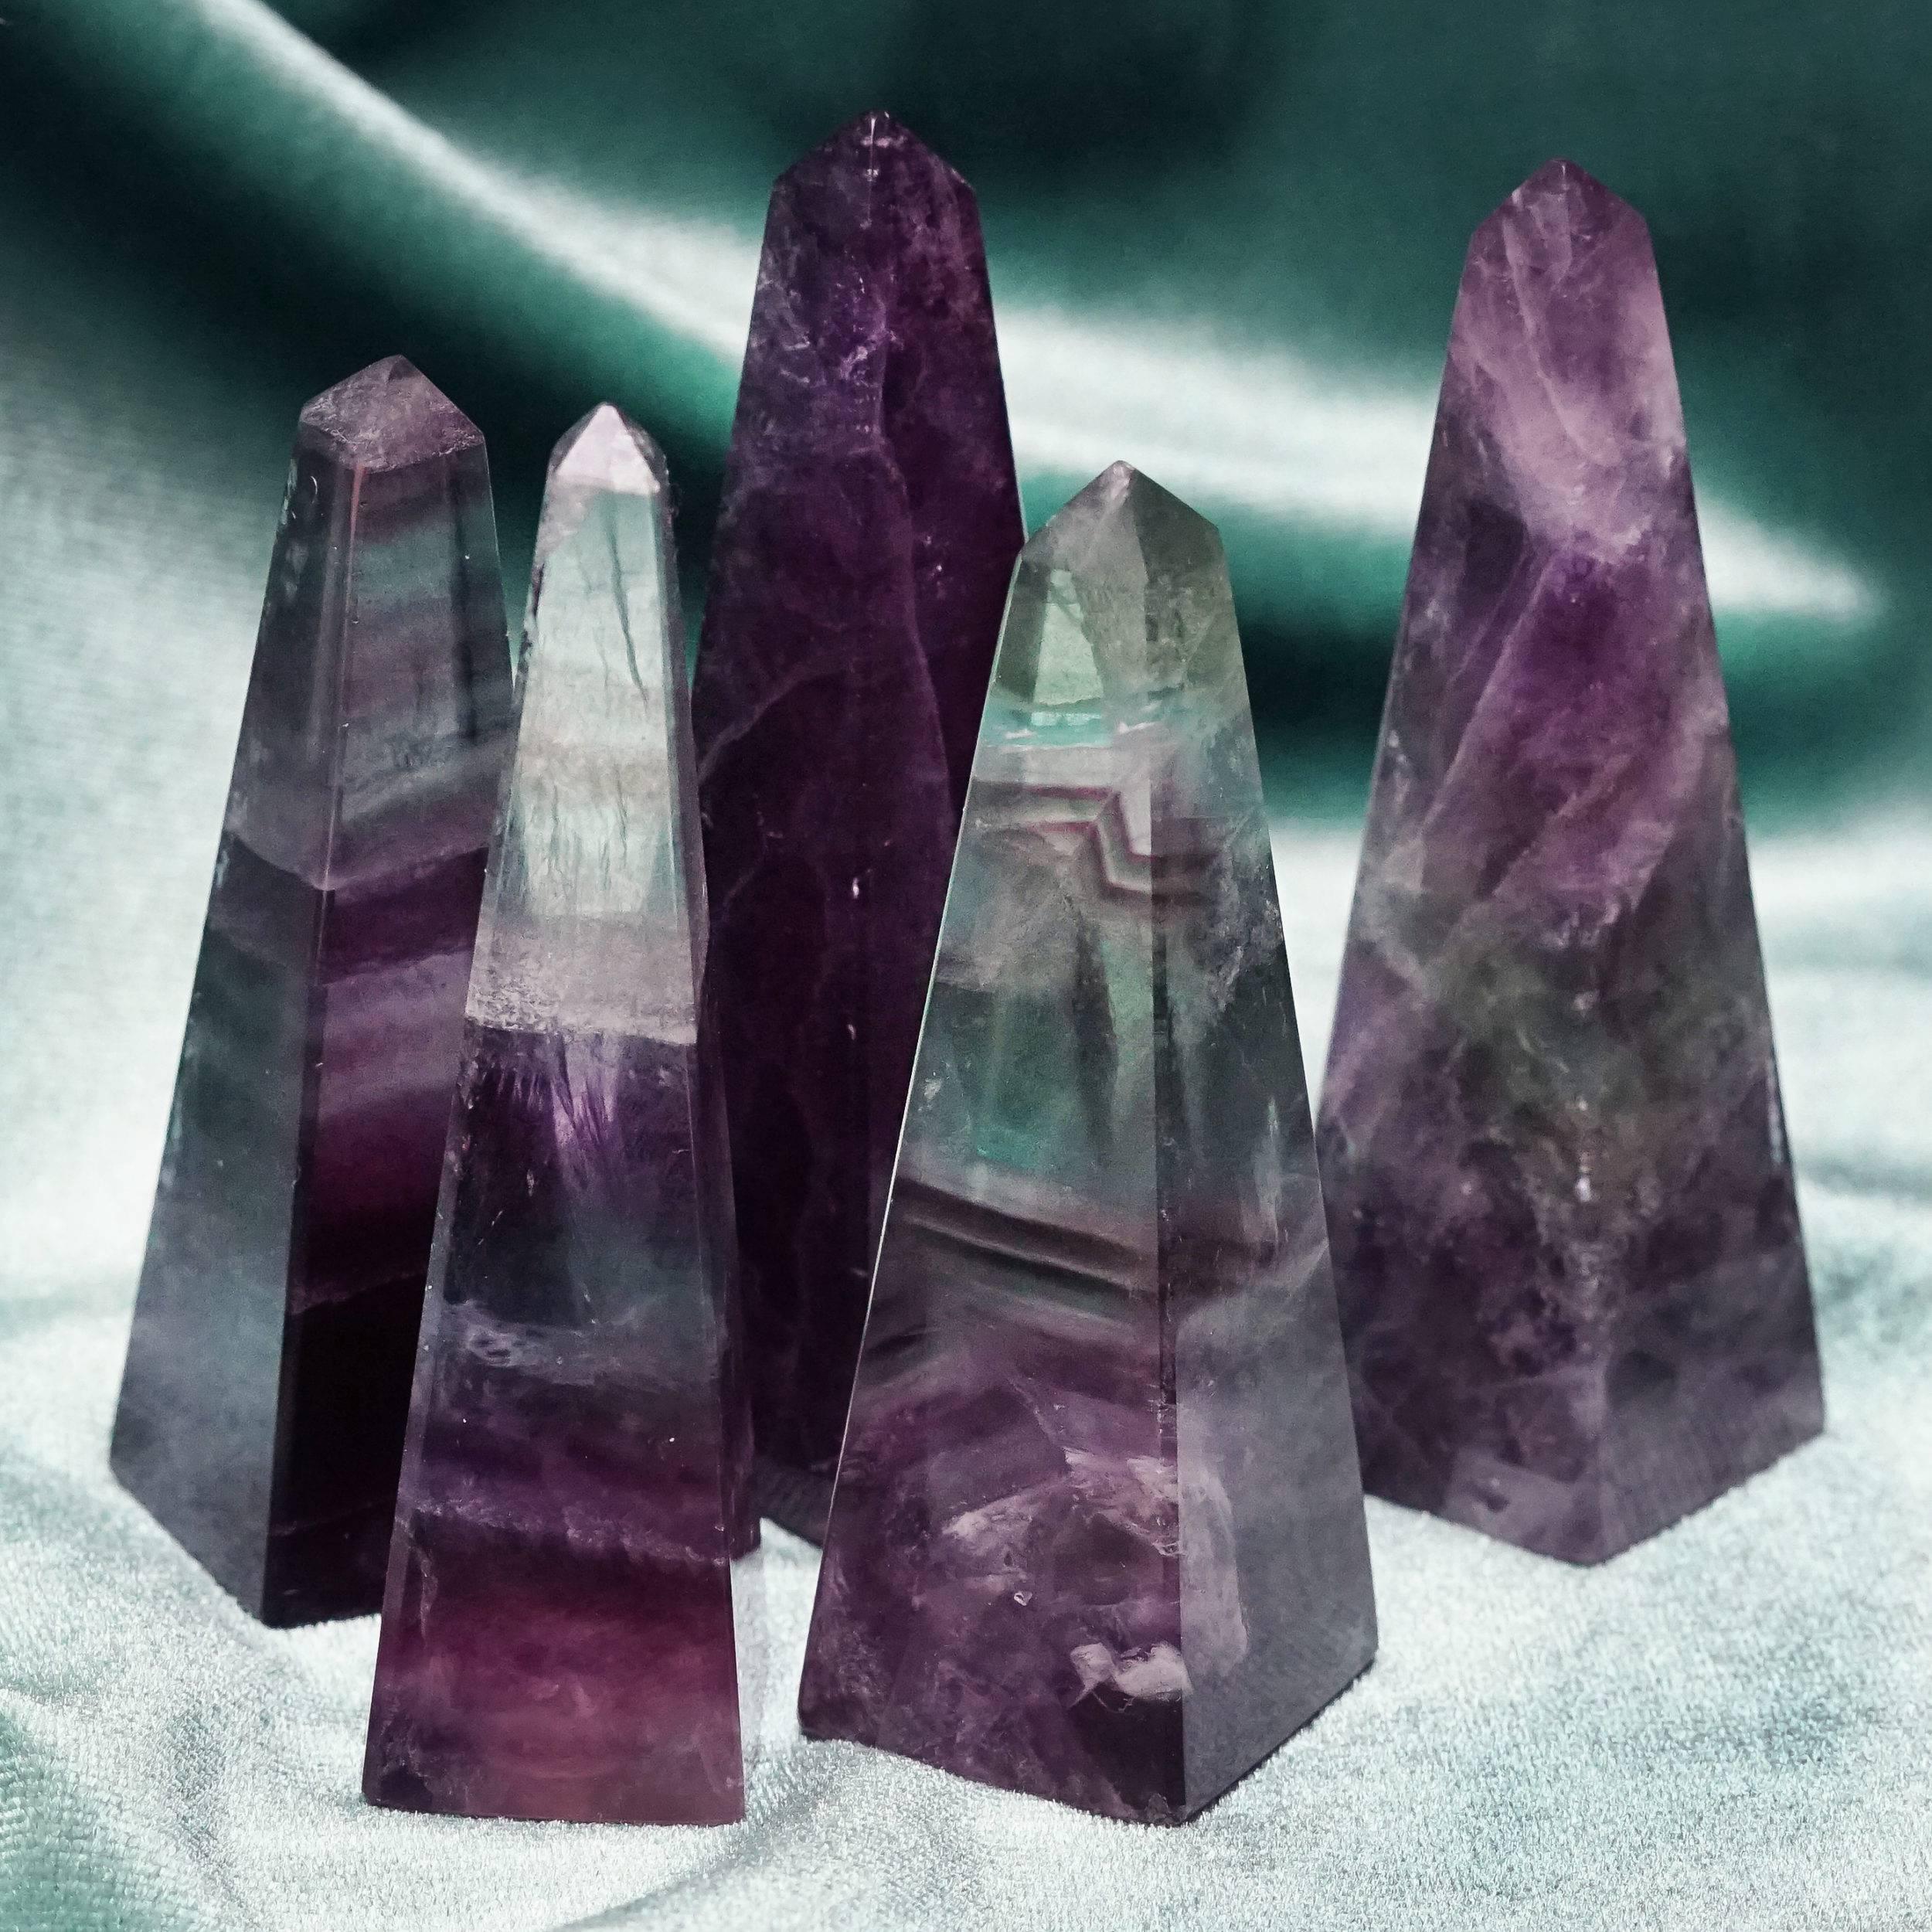 fluorite obelisks